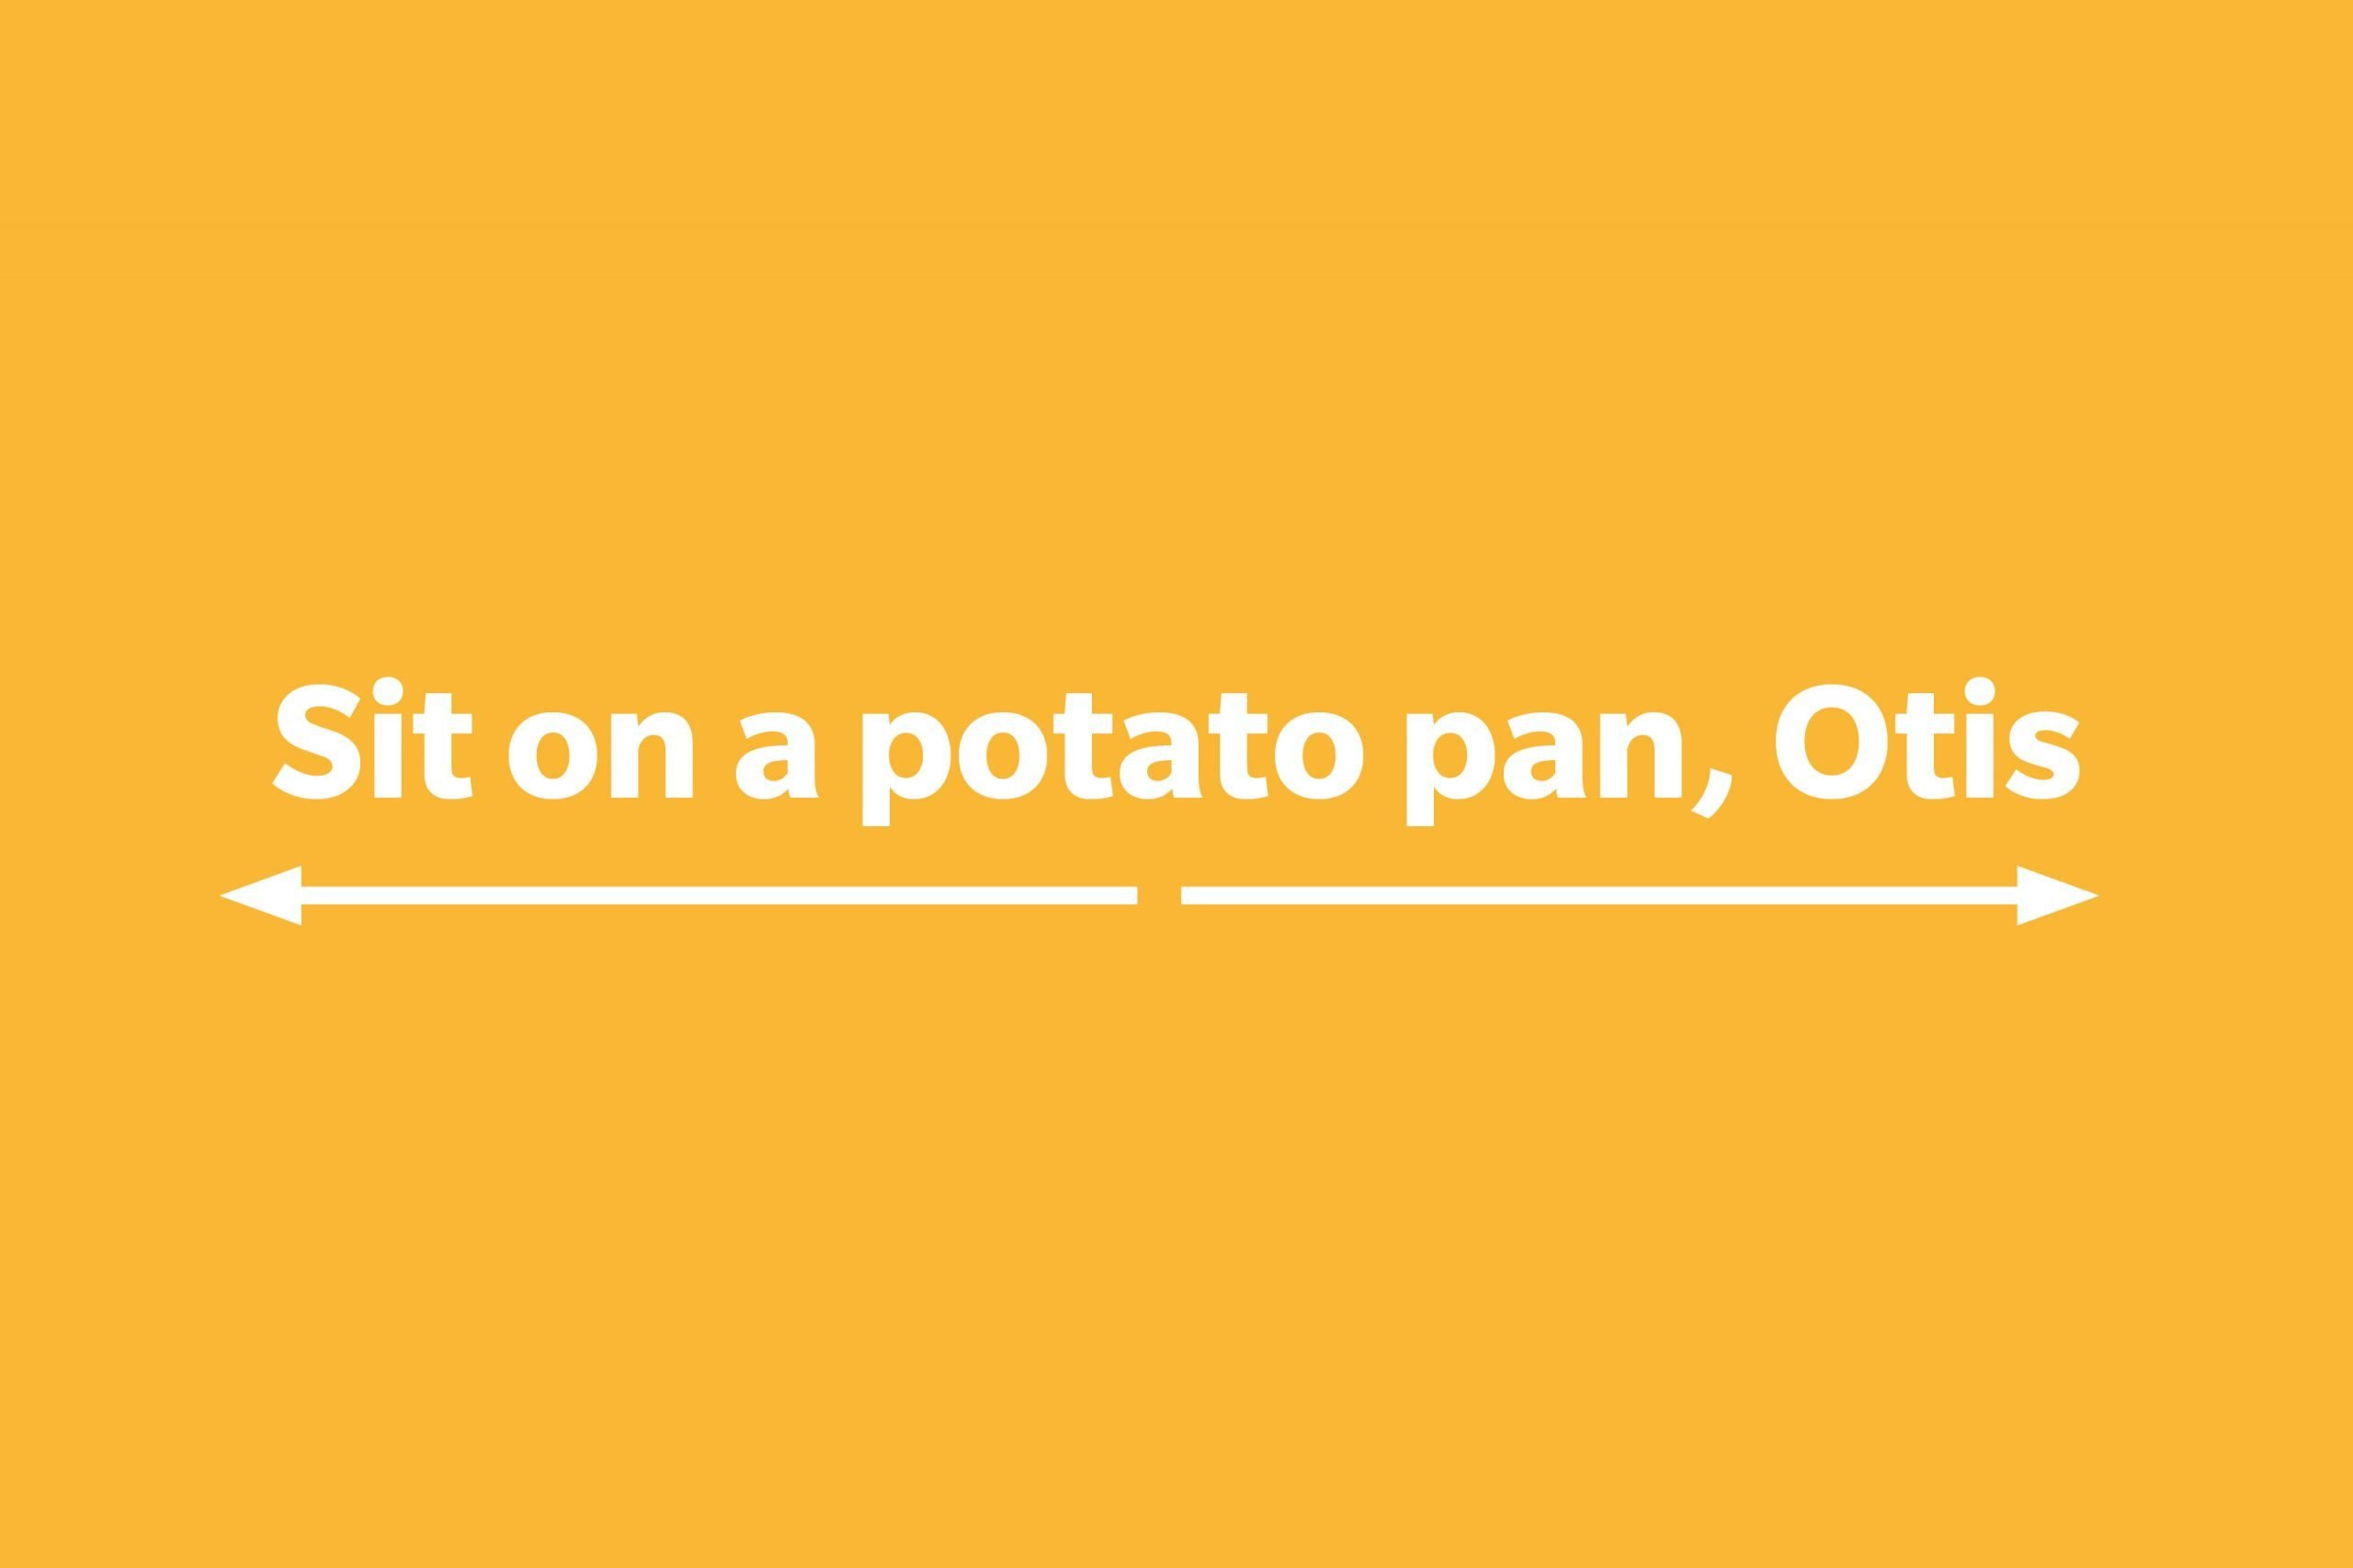 Sit on a potato pan, Otis